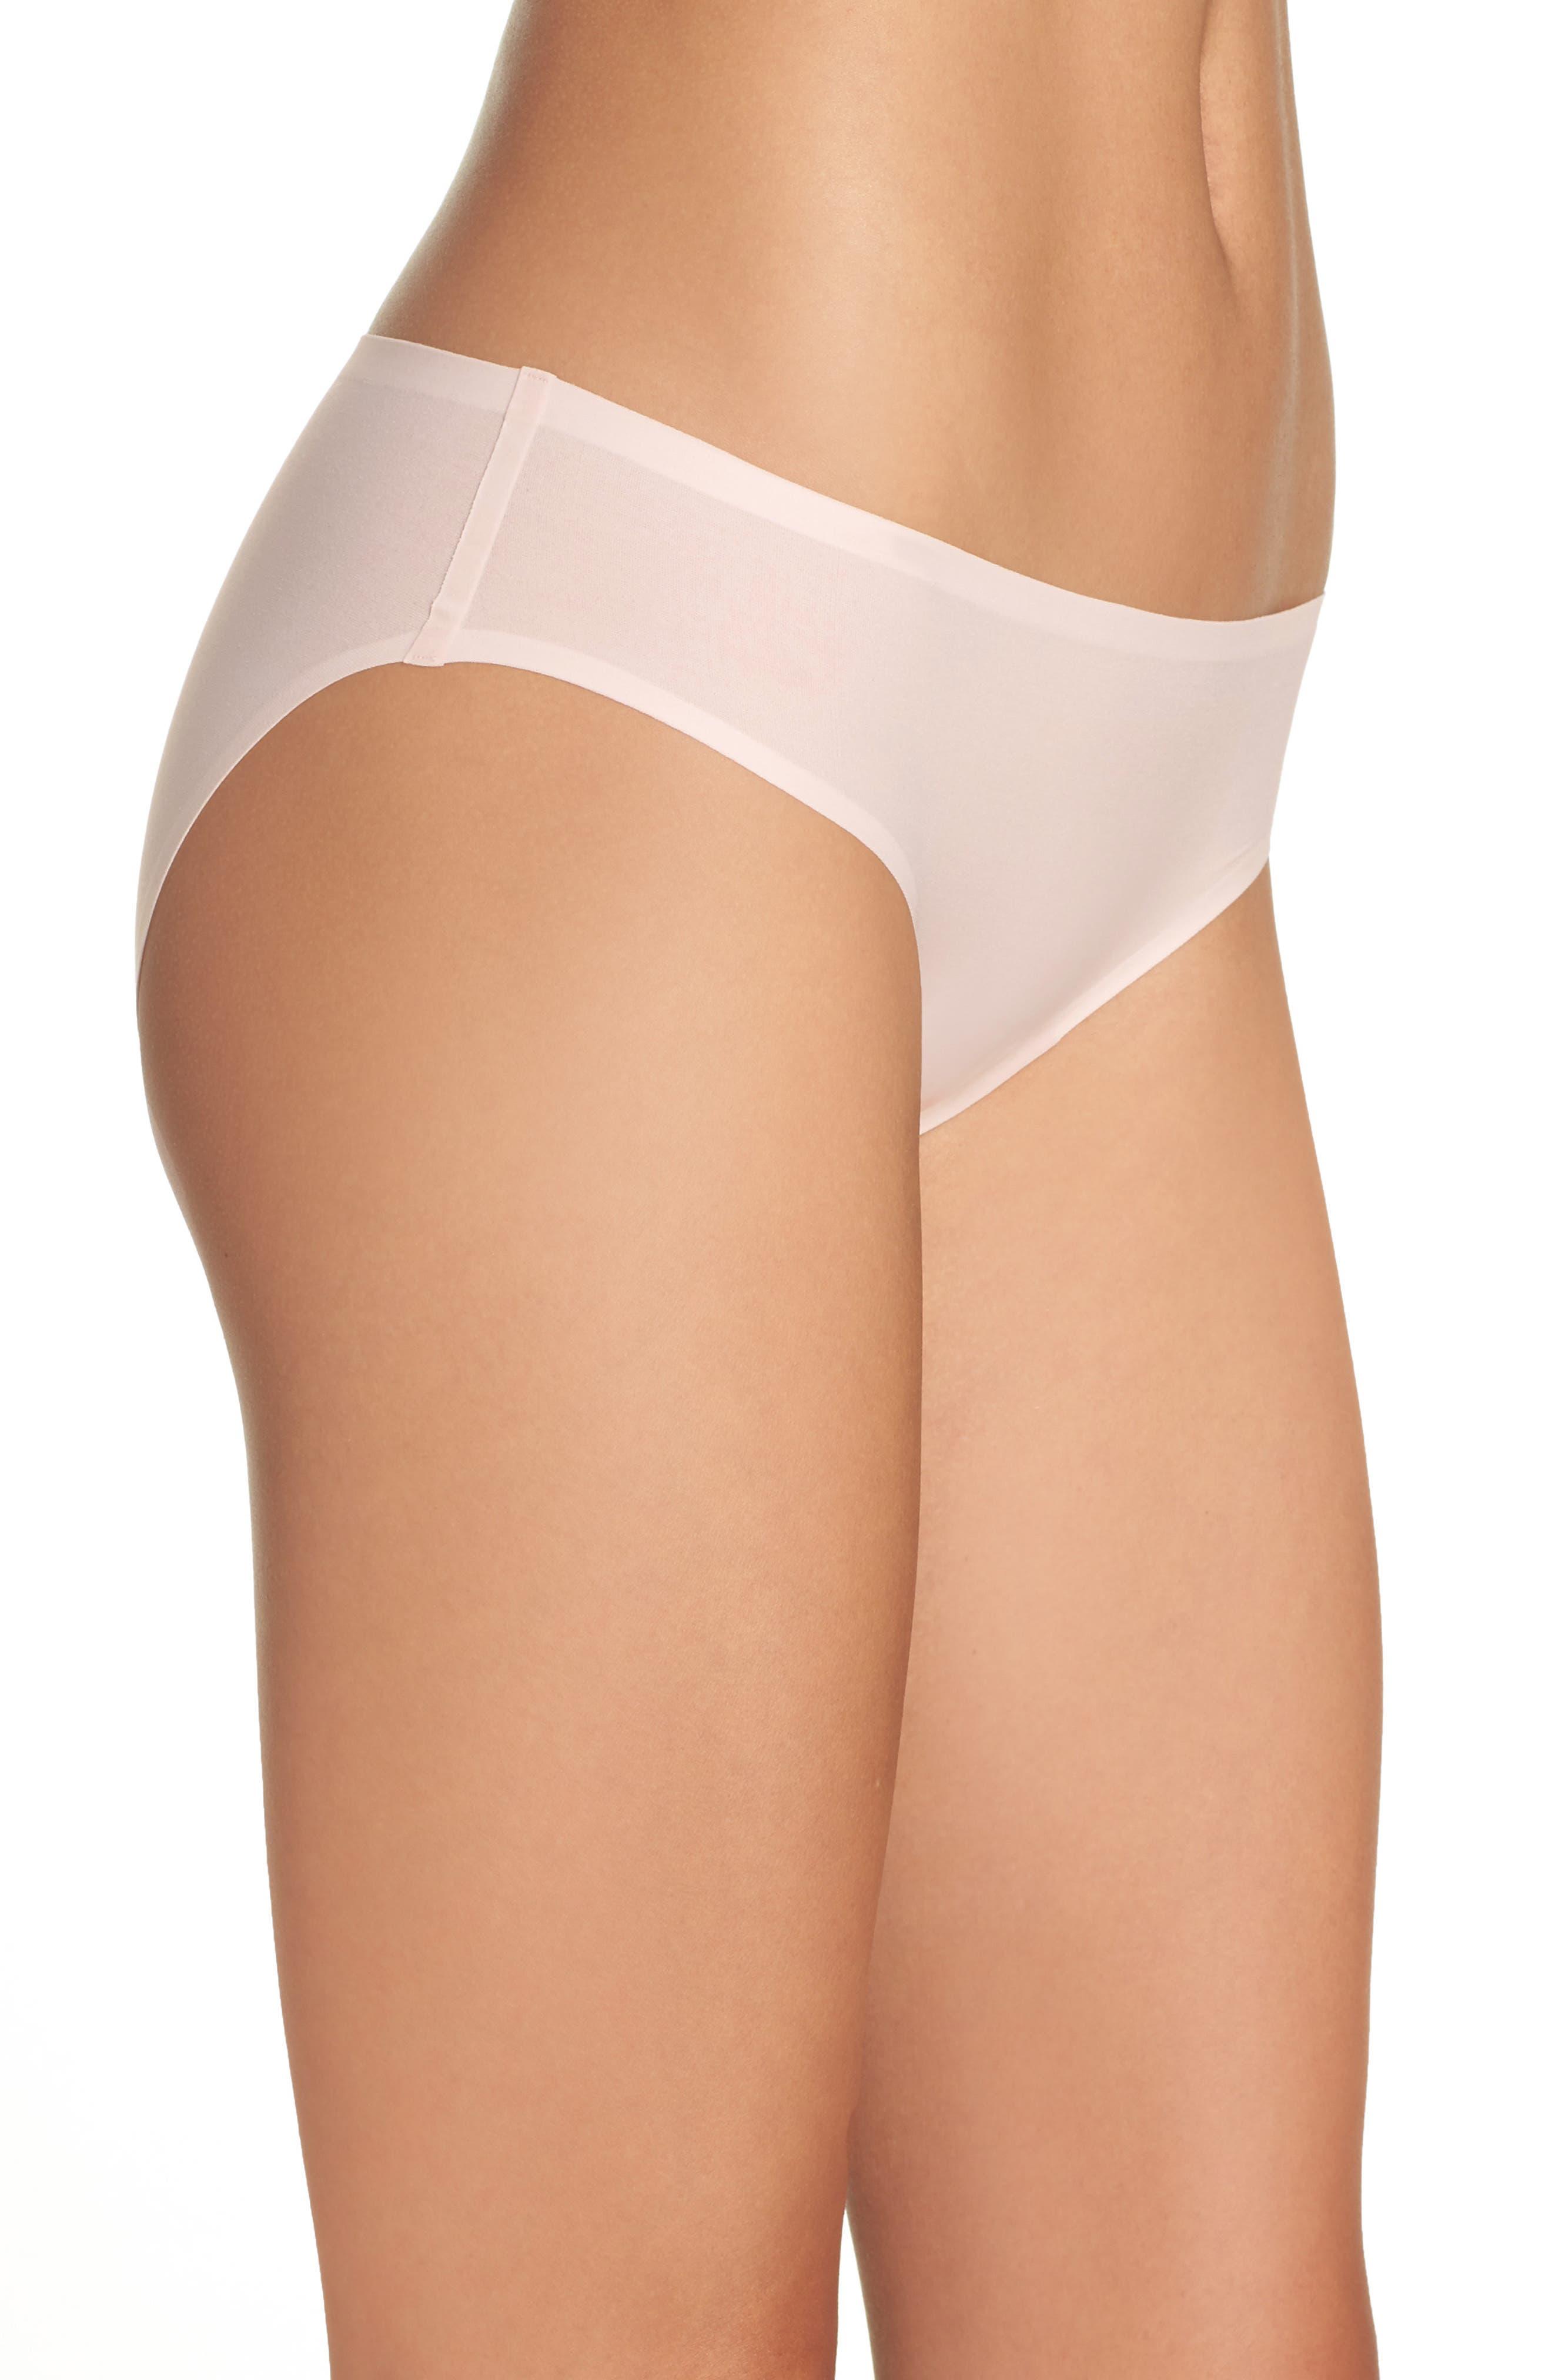 Alternate Image 3  - Chantelle Intimates Soft Stretch Seamless Bikini (3 for $45)